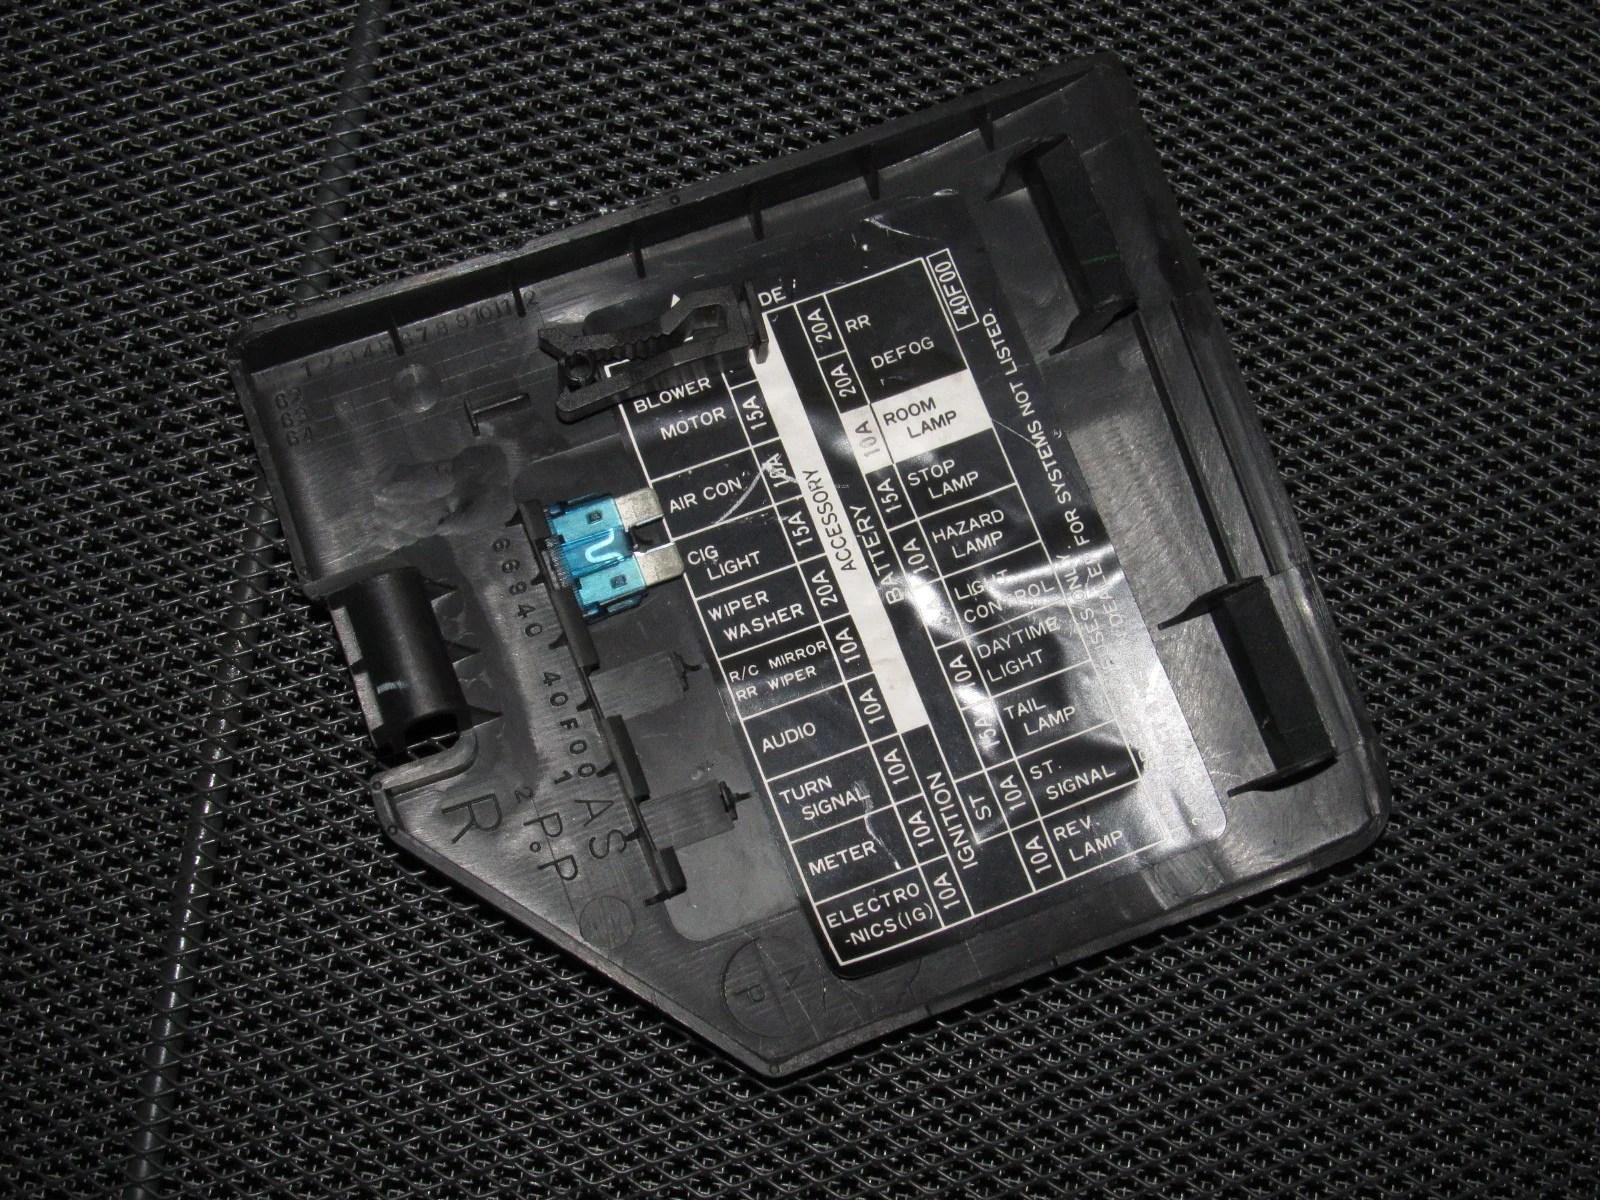 90 240sx fuse box cover wiring diagram post90 240sx fuse box cover wiring diagram 89 90 [ 1600 x 1200 Pixel ]